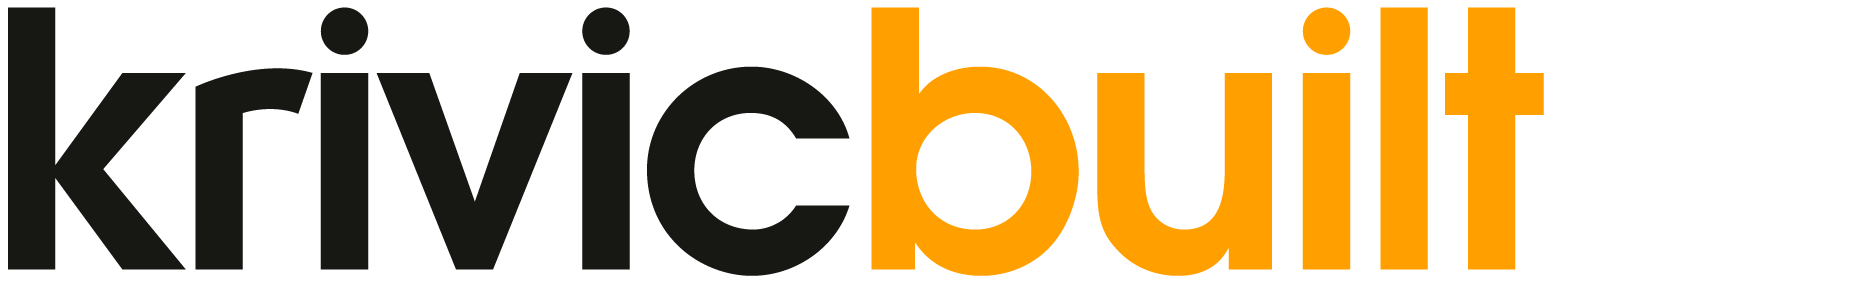 krivic-built-logo.png